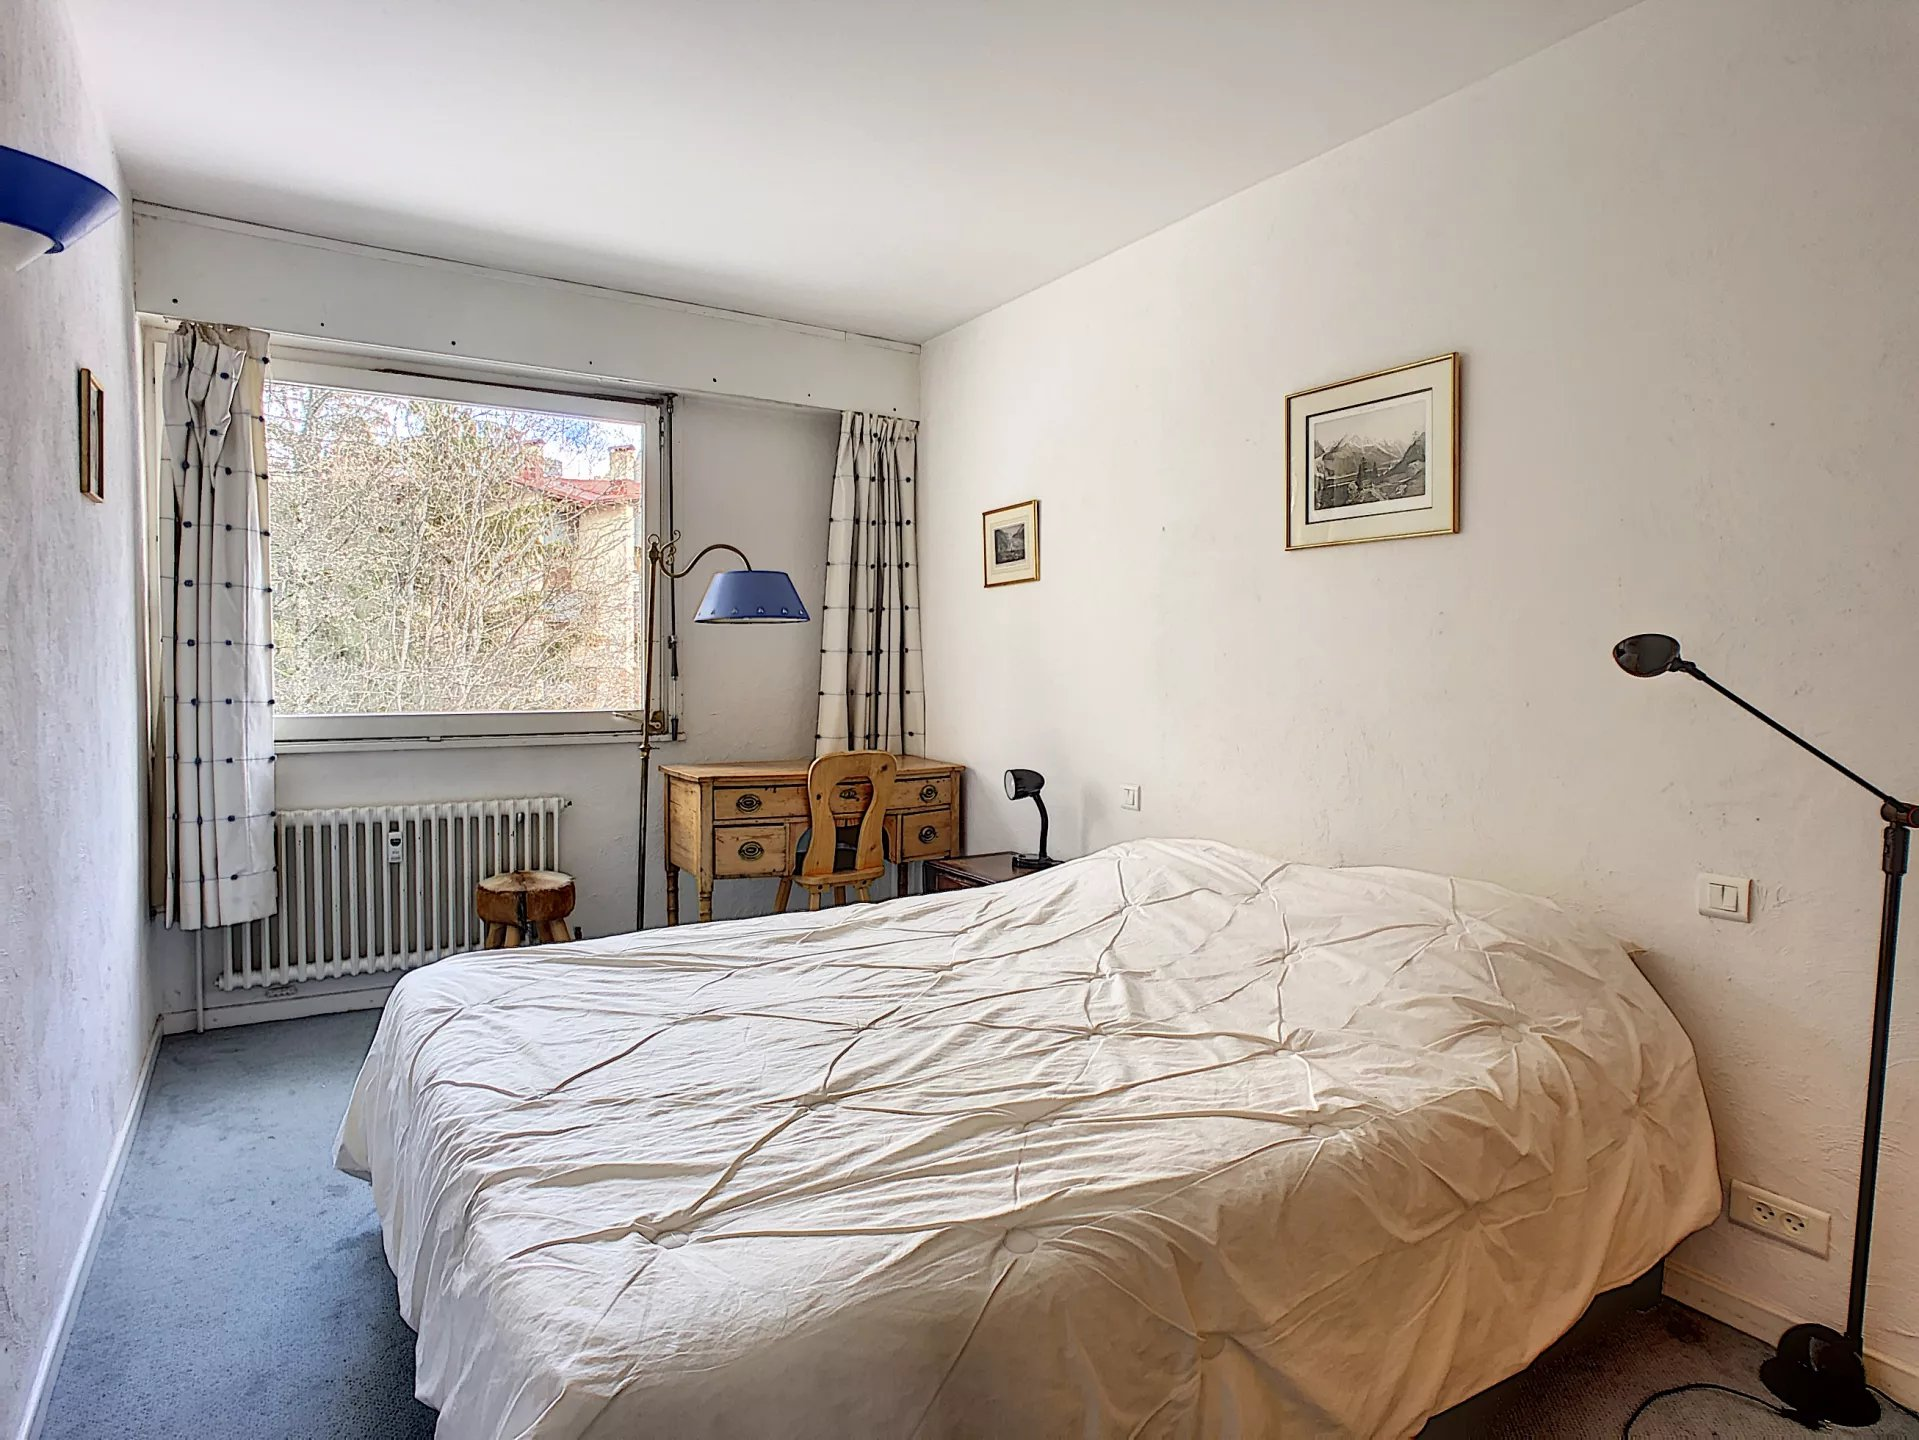 2 bedroom apartment panoramic view